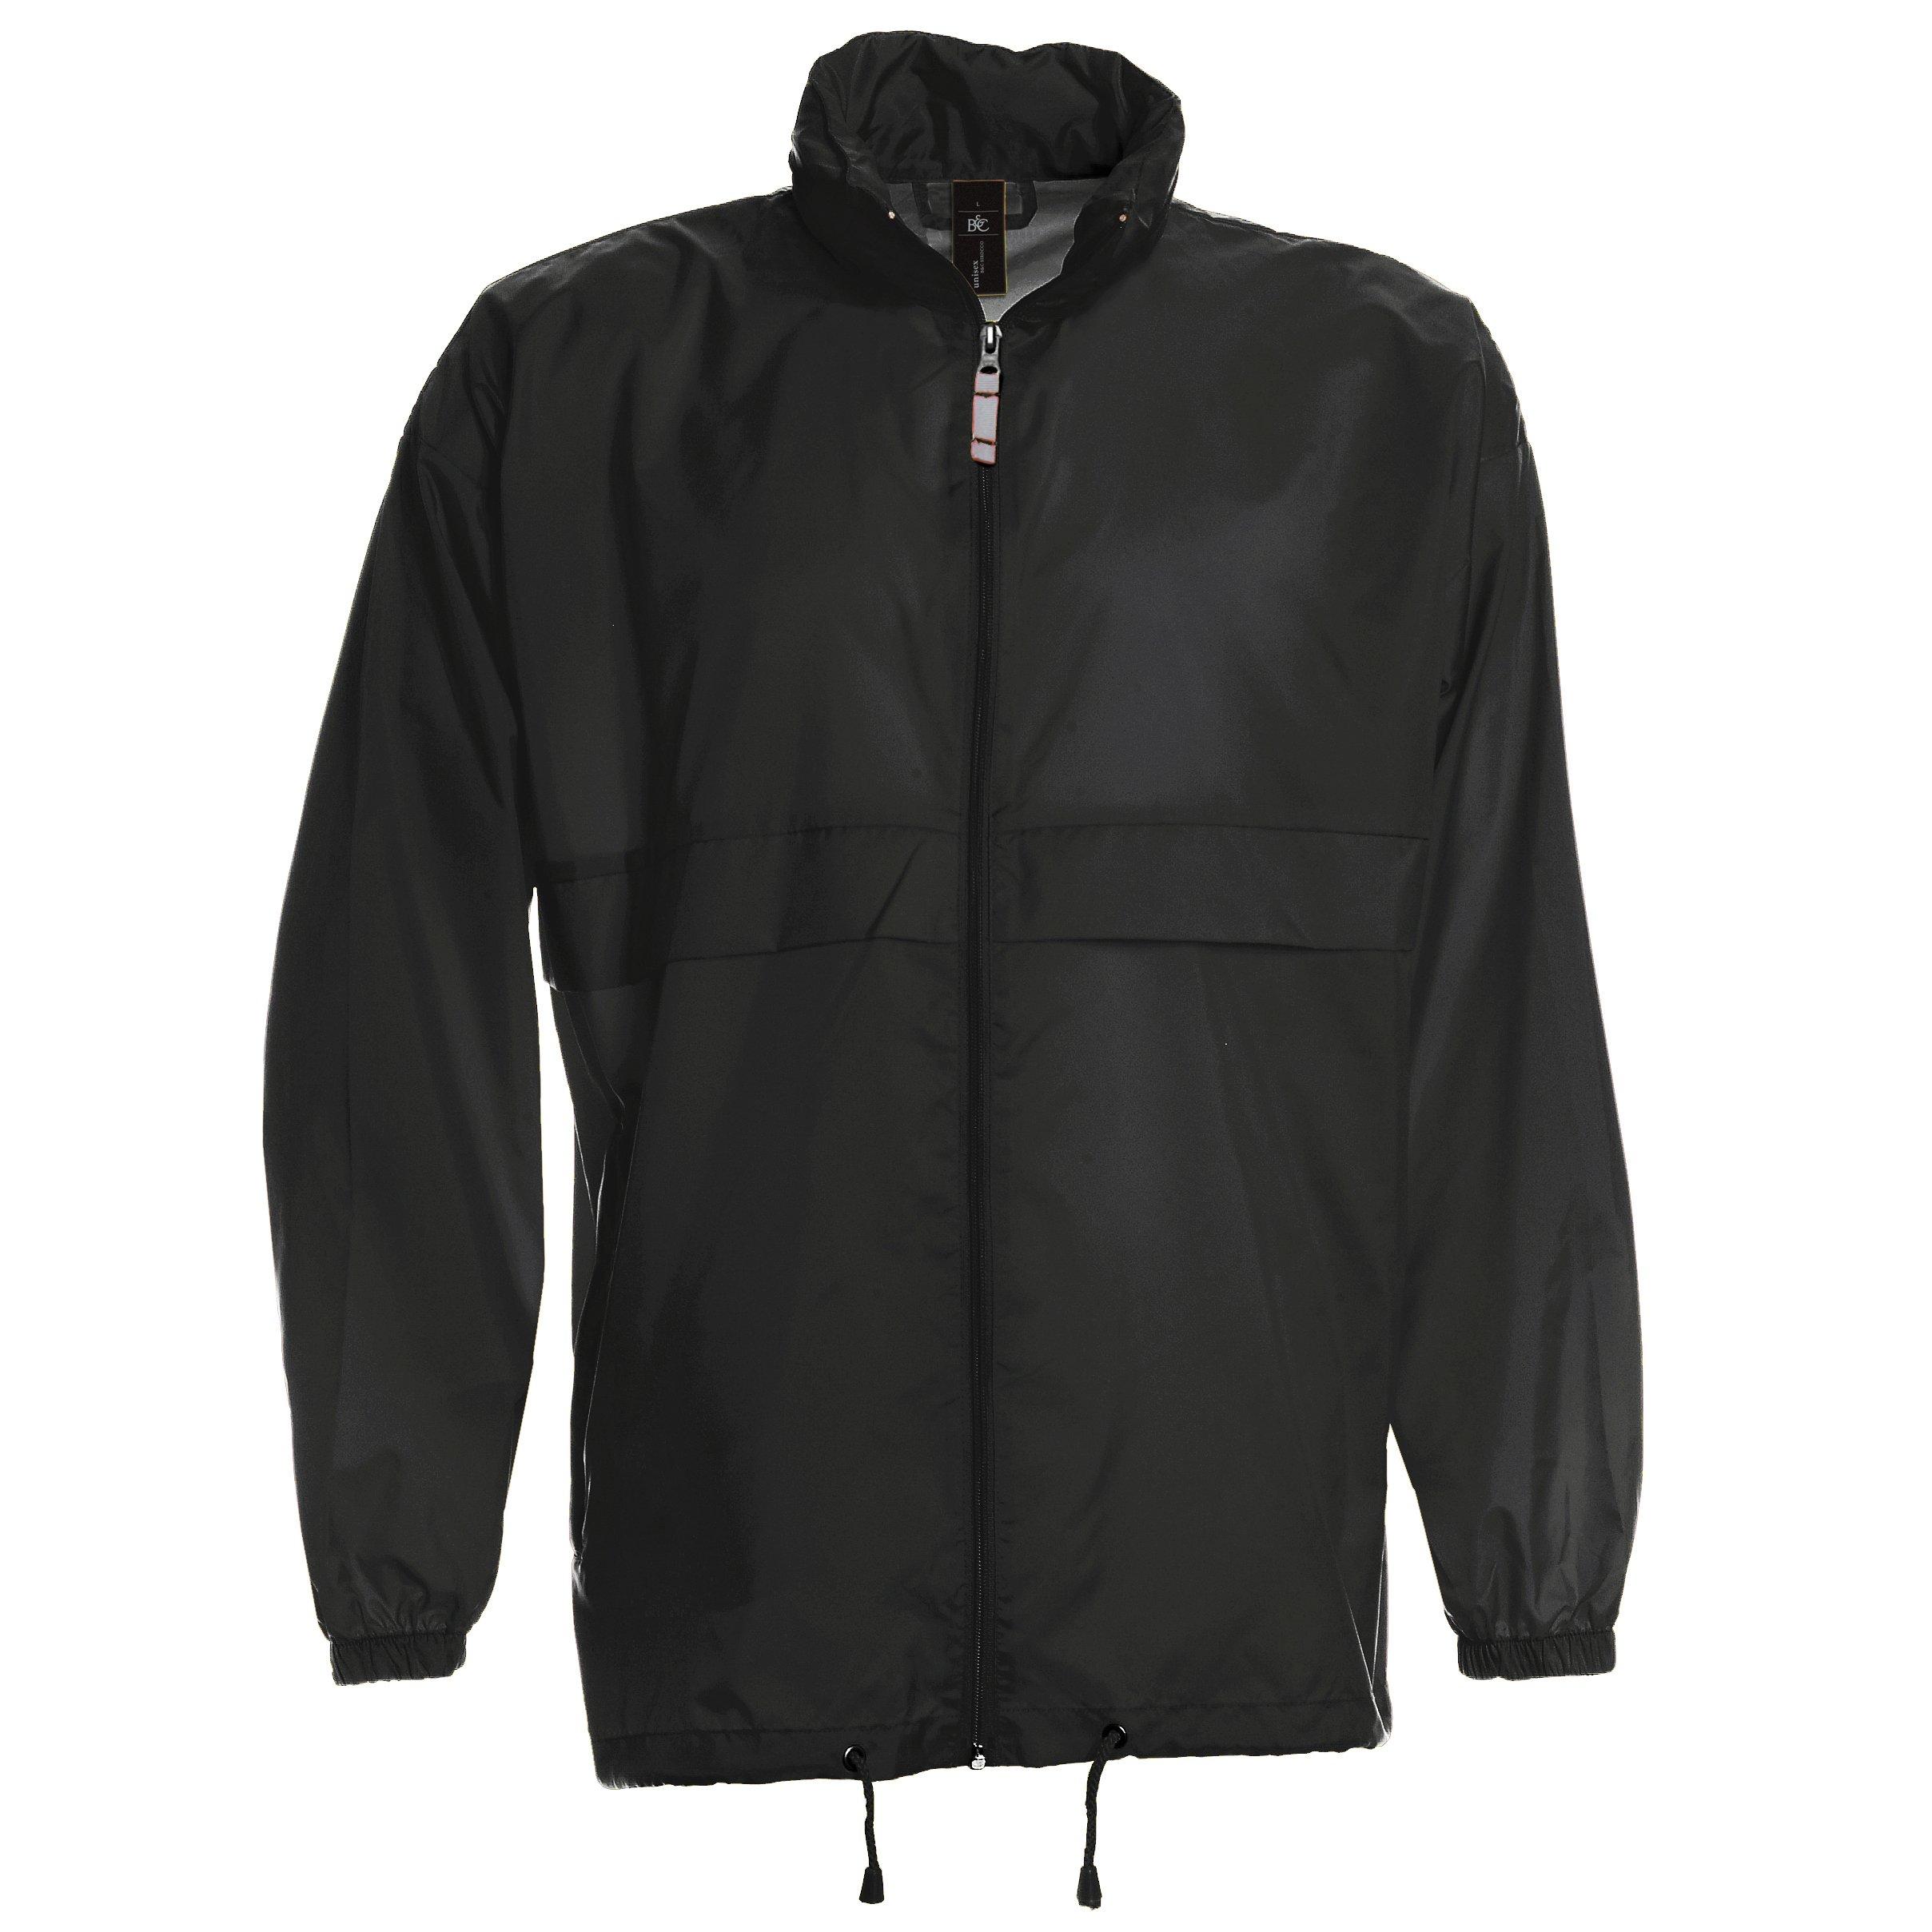 B&C Sirocco Mens Lightweight Jacket/Mens Outer Jackets (XXL) (Black)